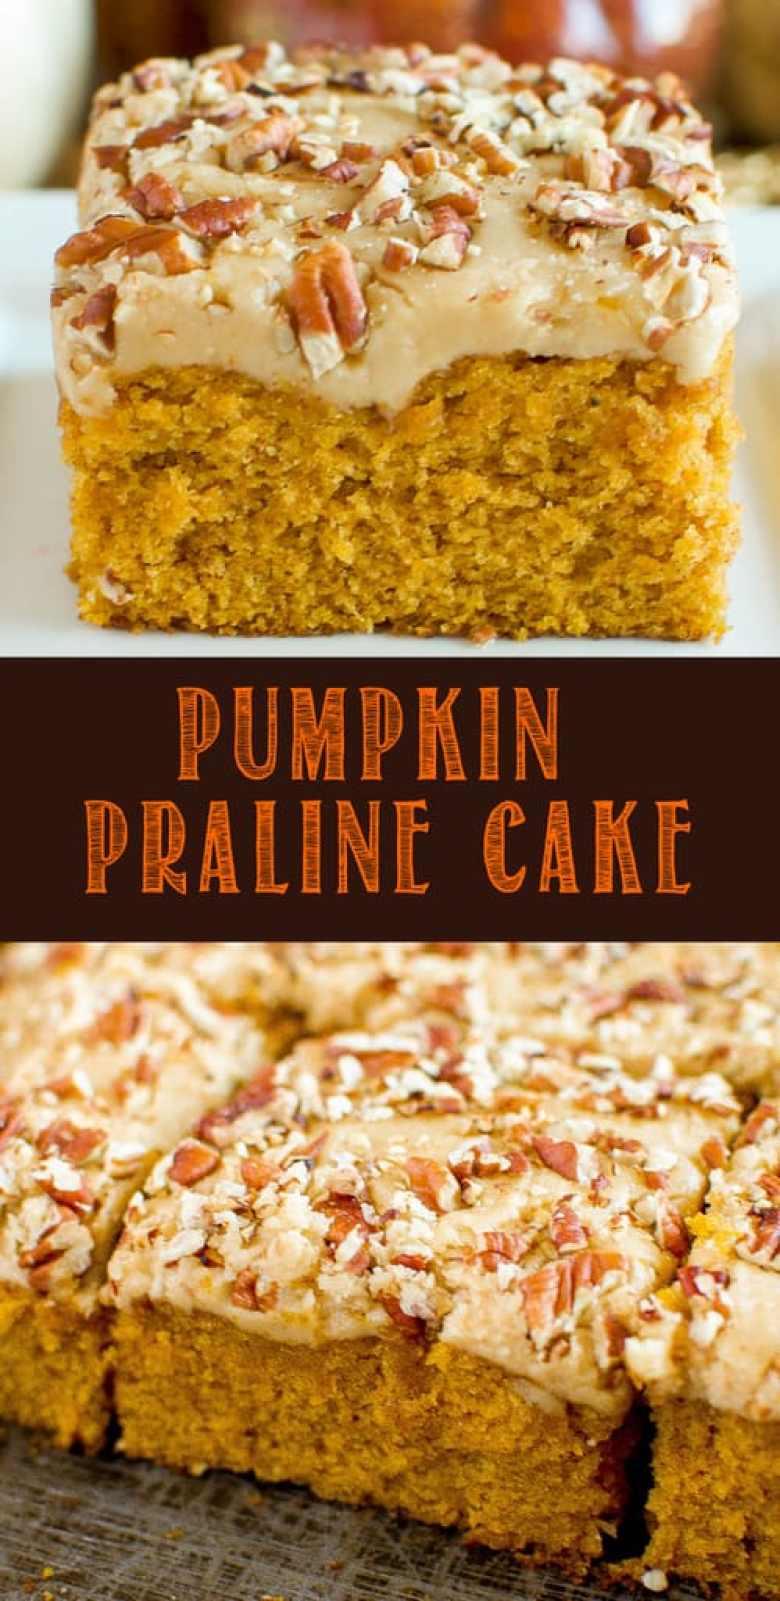 pumpkin praline cake collage photo